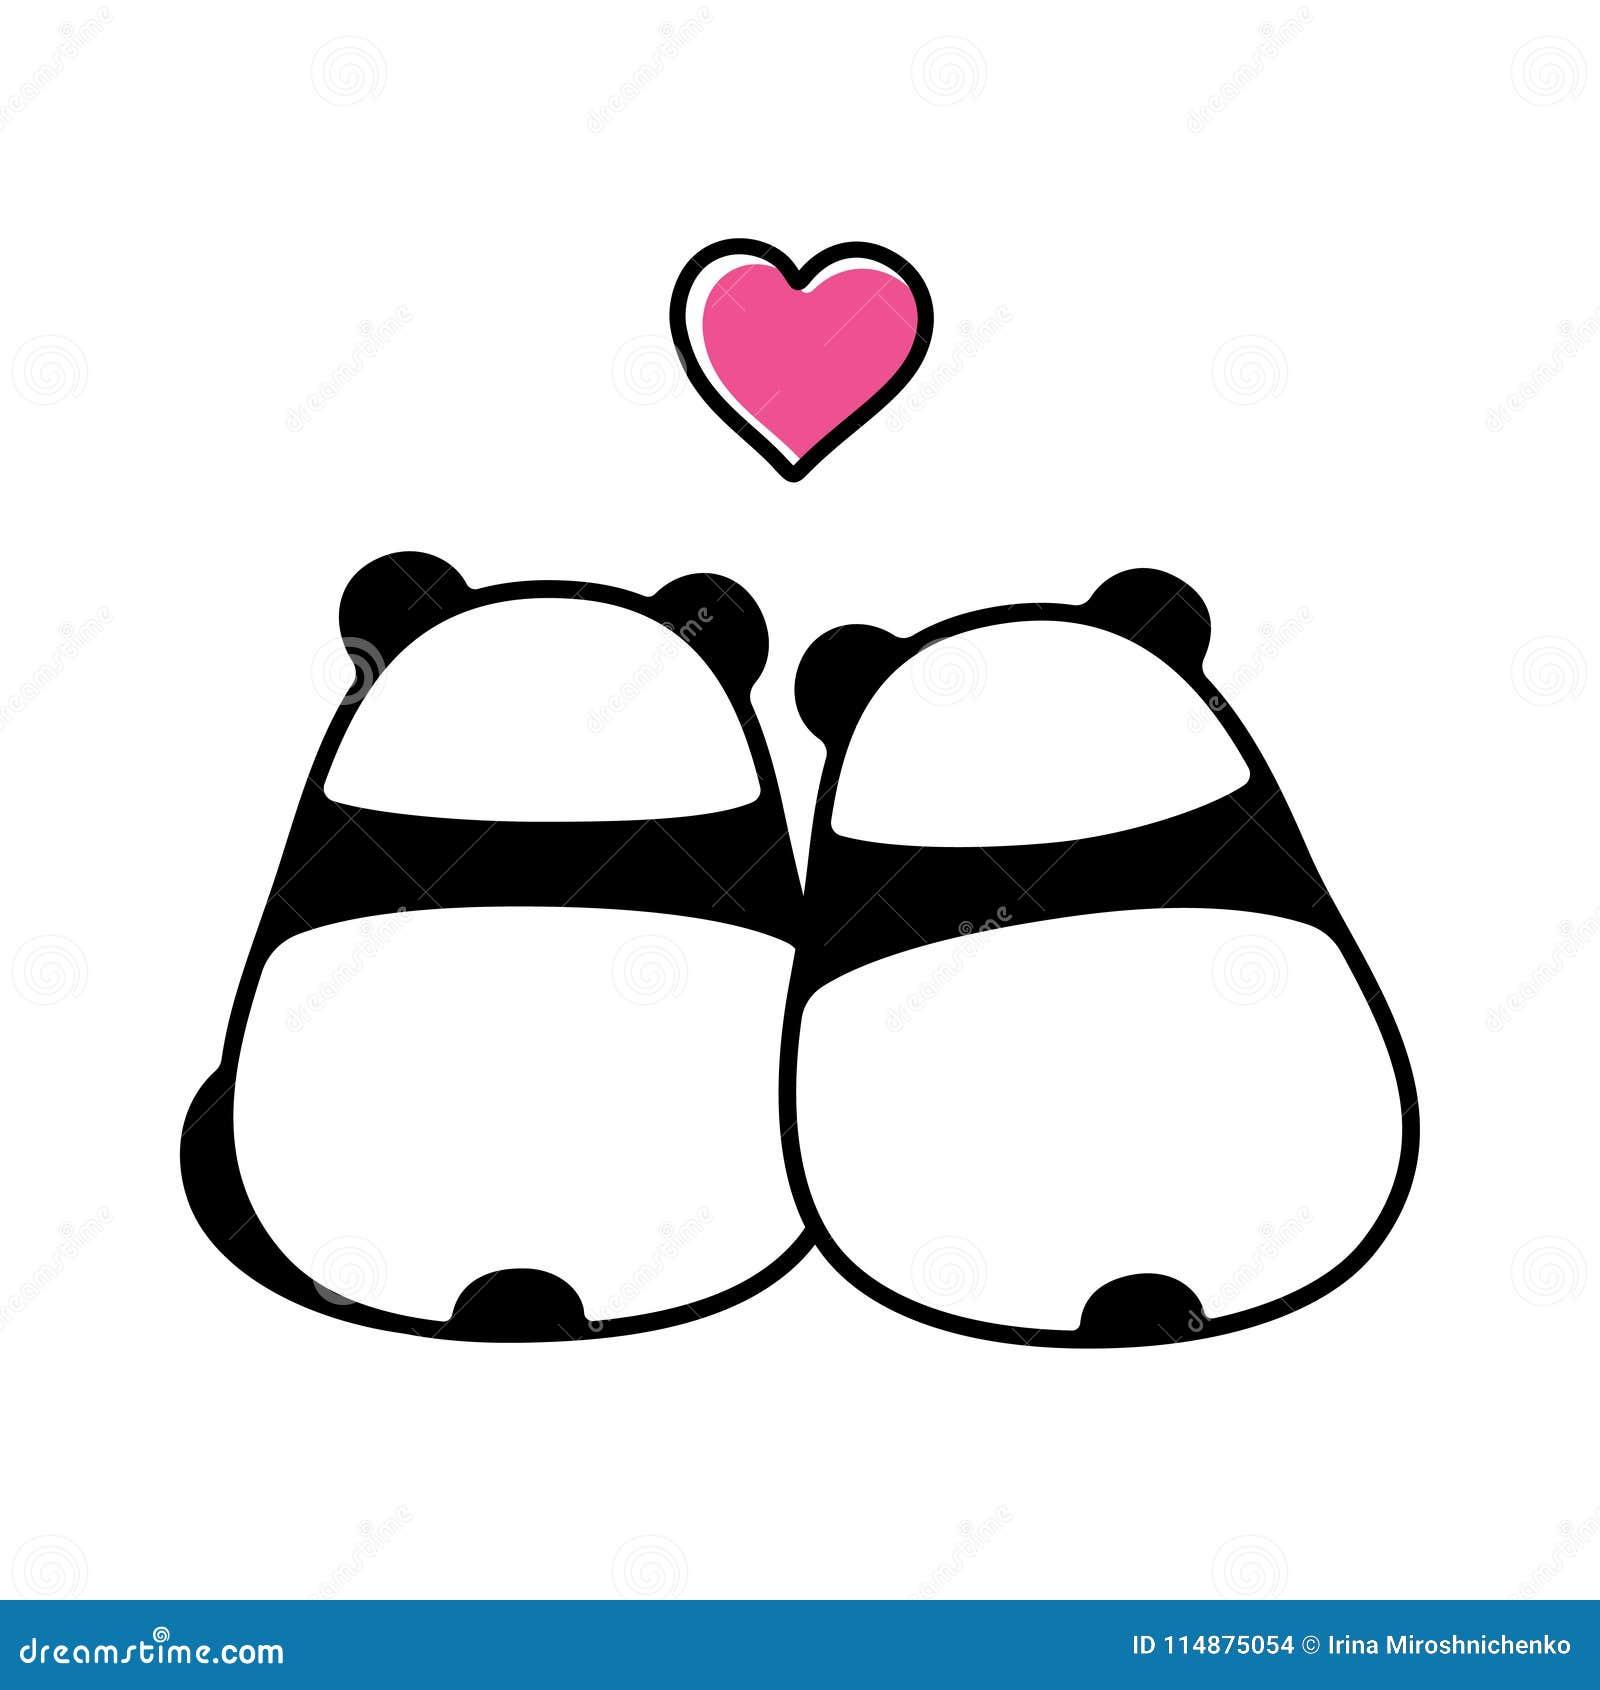 Cute panda couple in love stock vector. Illustration of ...